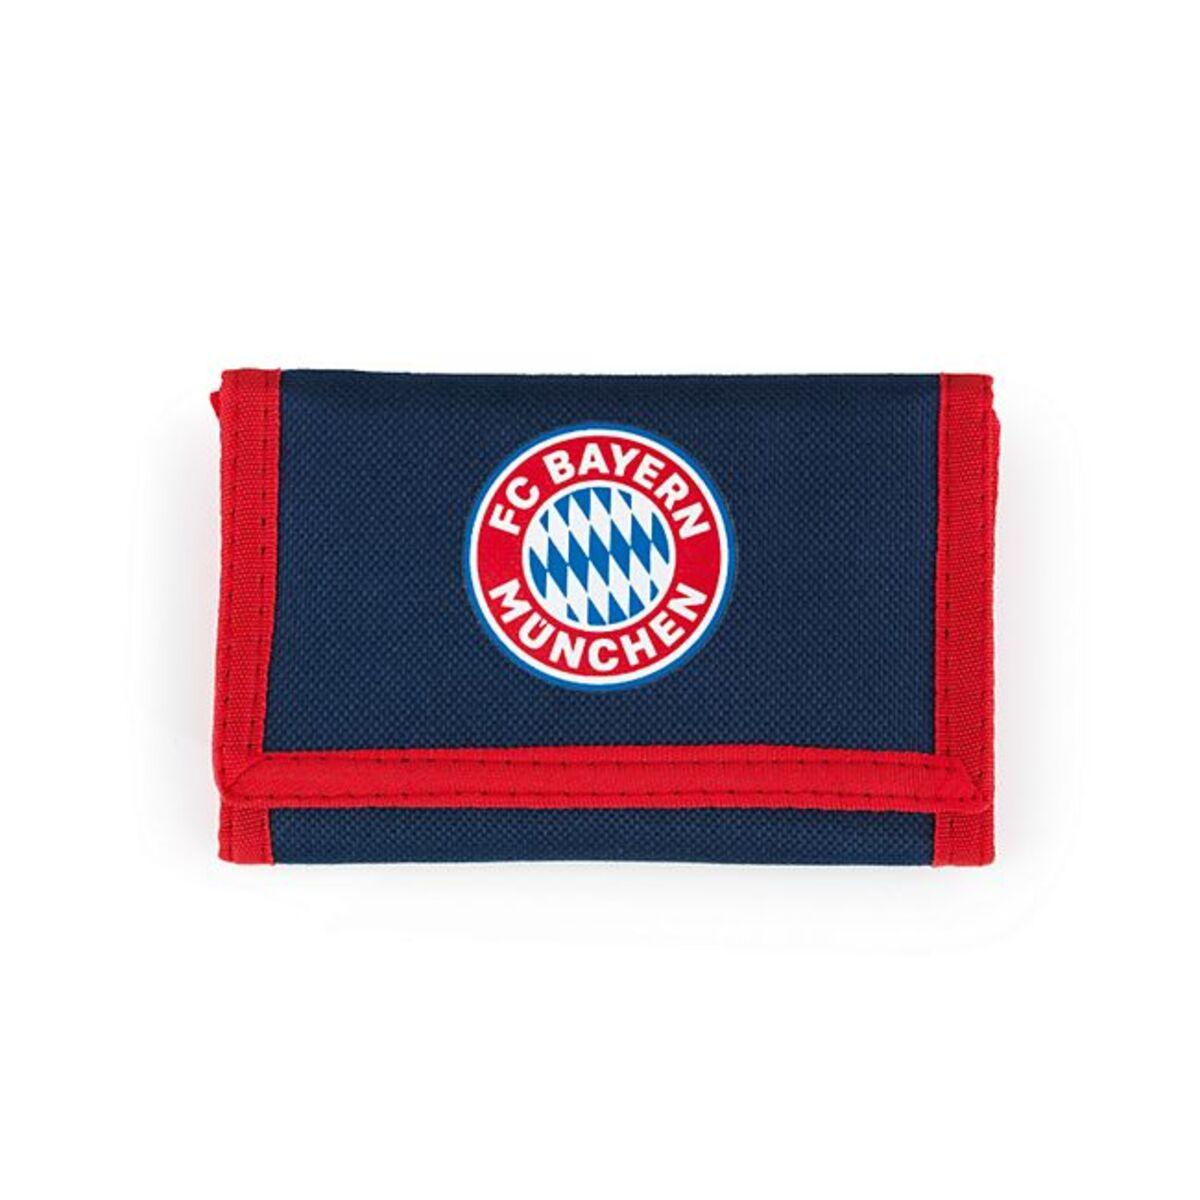 Bild 1 von FCB Geldbörse Mia san Mia blau/rot mit Logo